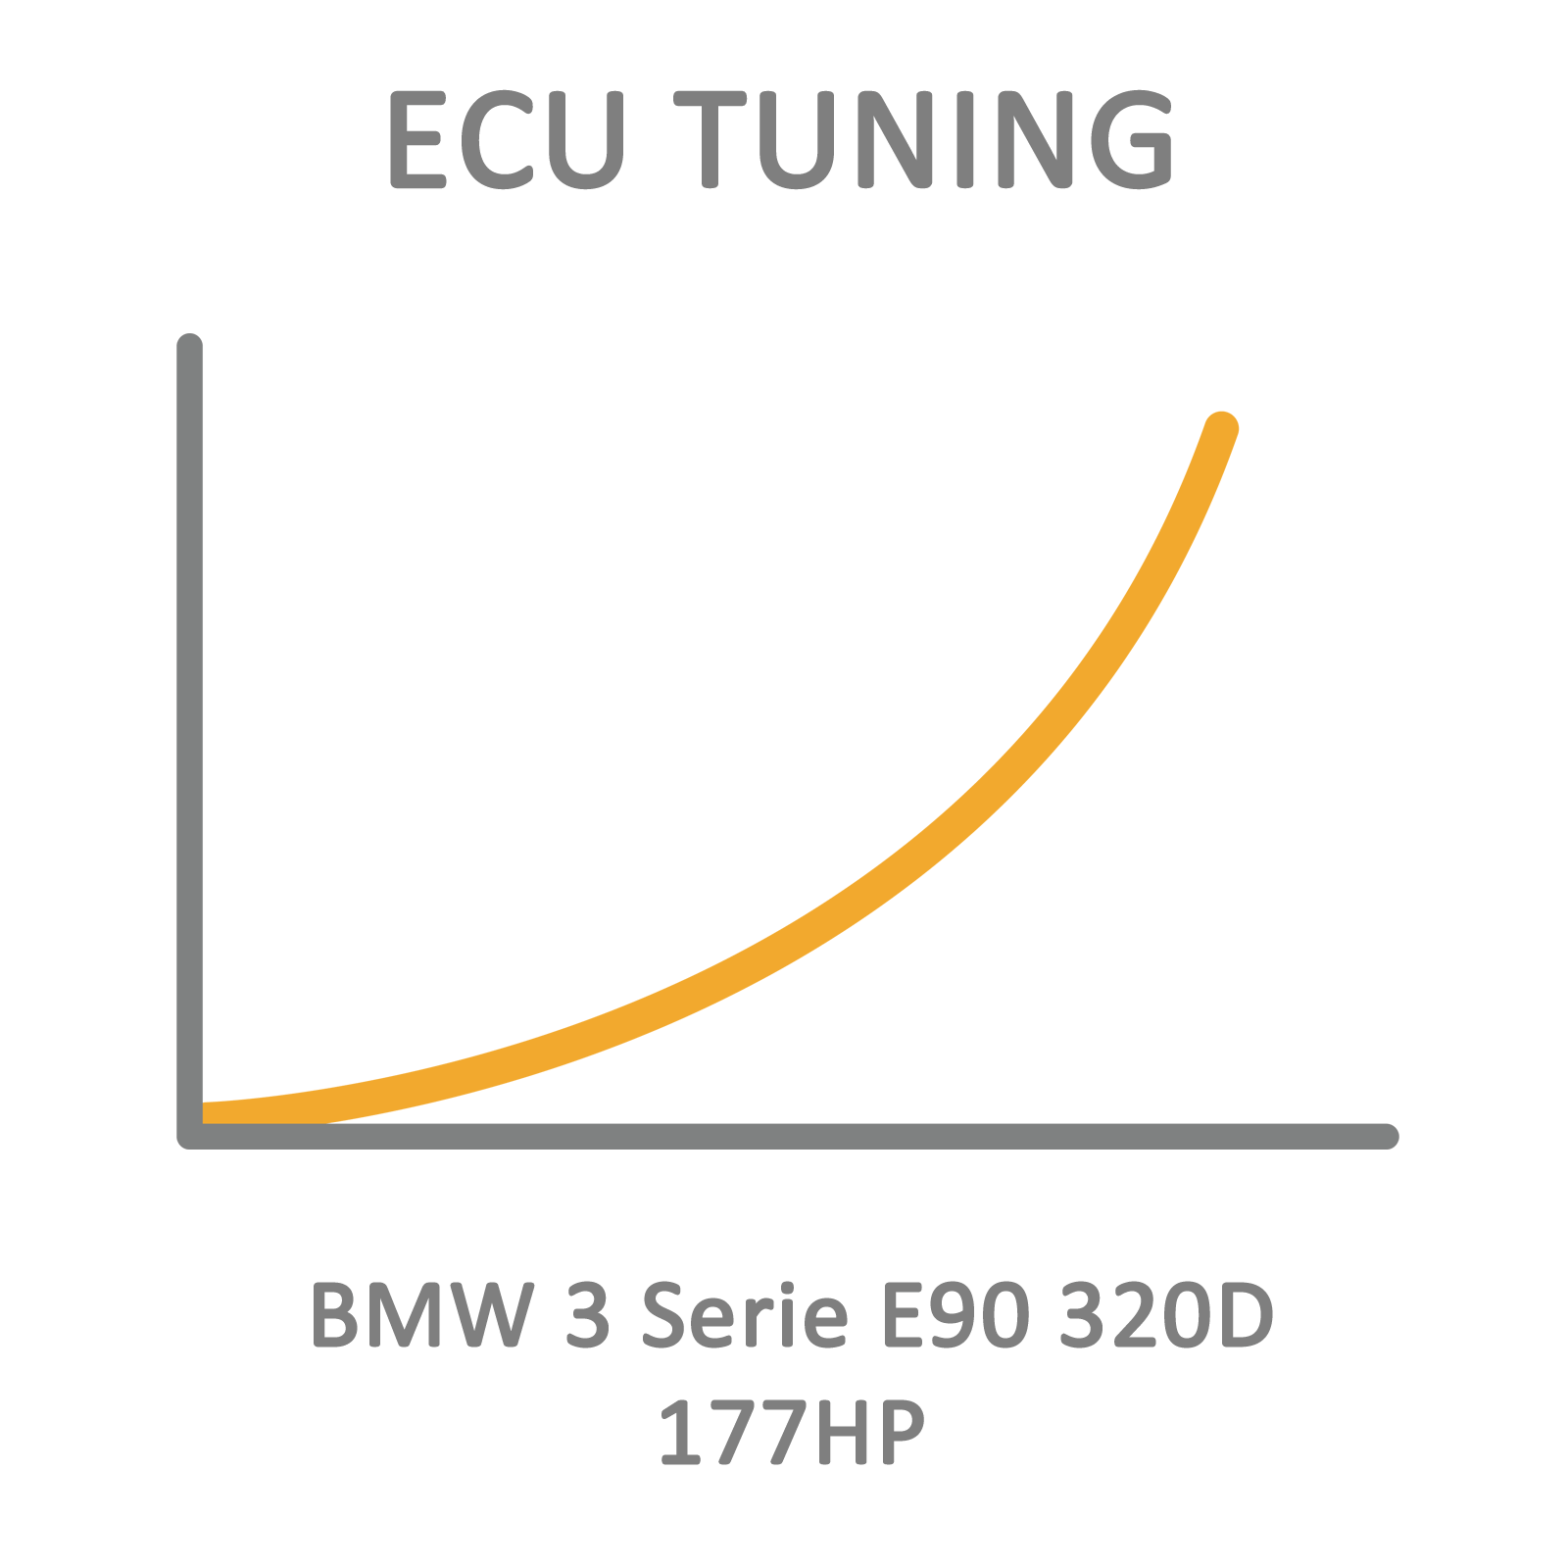 BMW 3 Series E90 320D 177HP ECU Tuning Remapping Programming